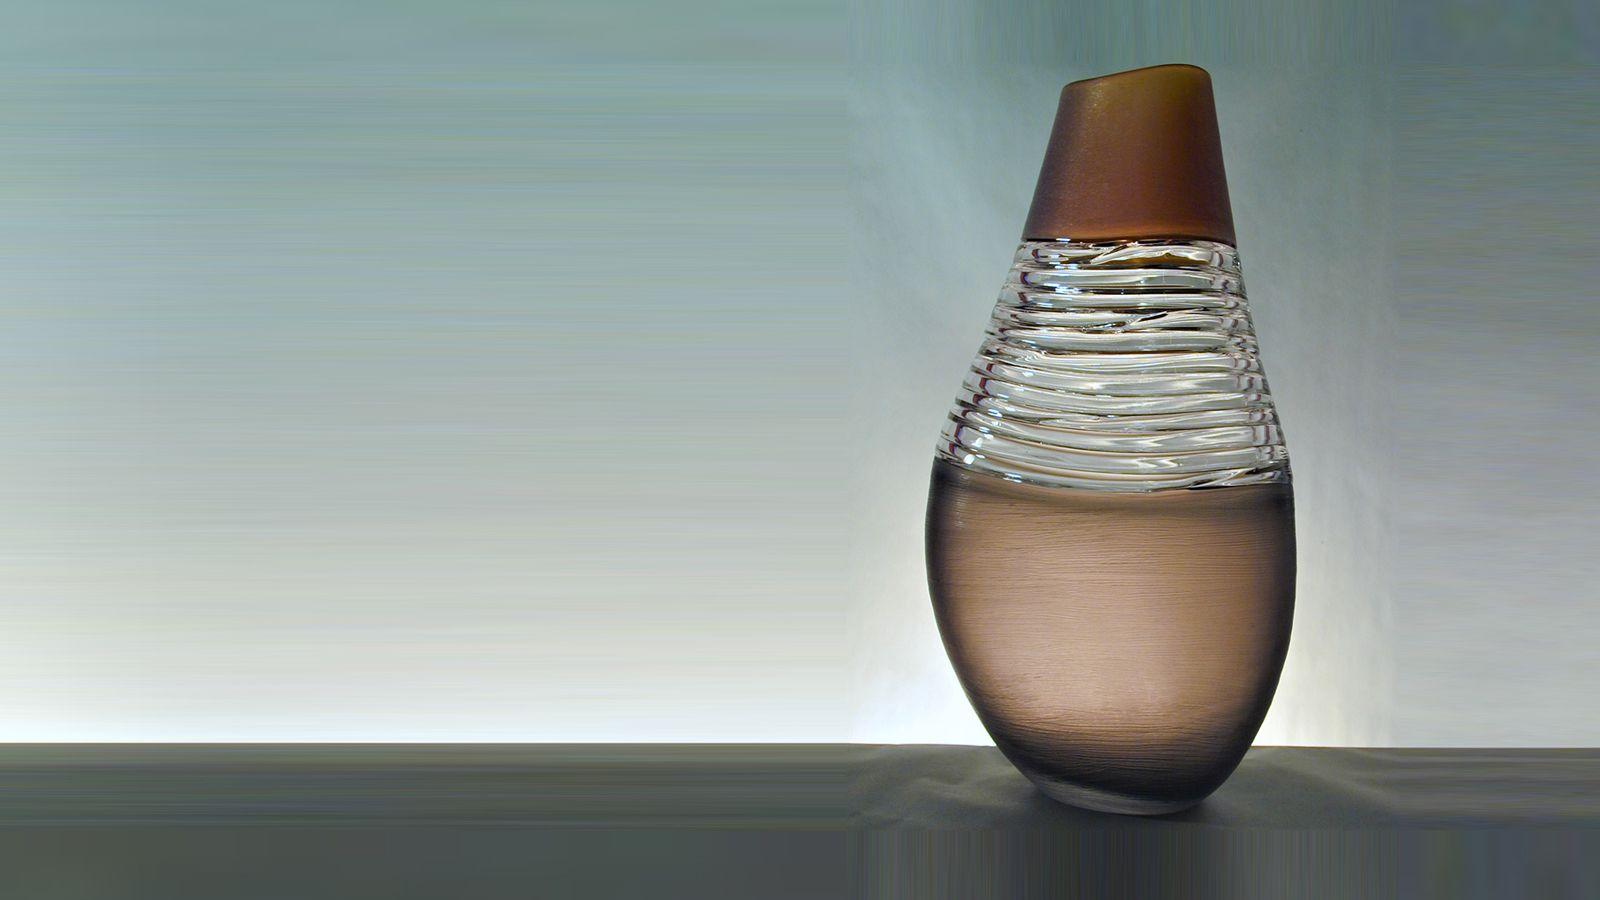 Stewart Hearn Hand Blown Glass Strata Vase, Amber & Grey with Clear Trails